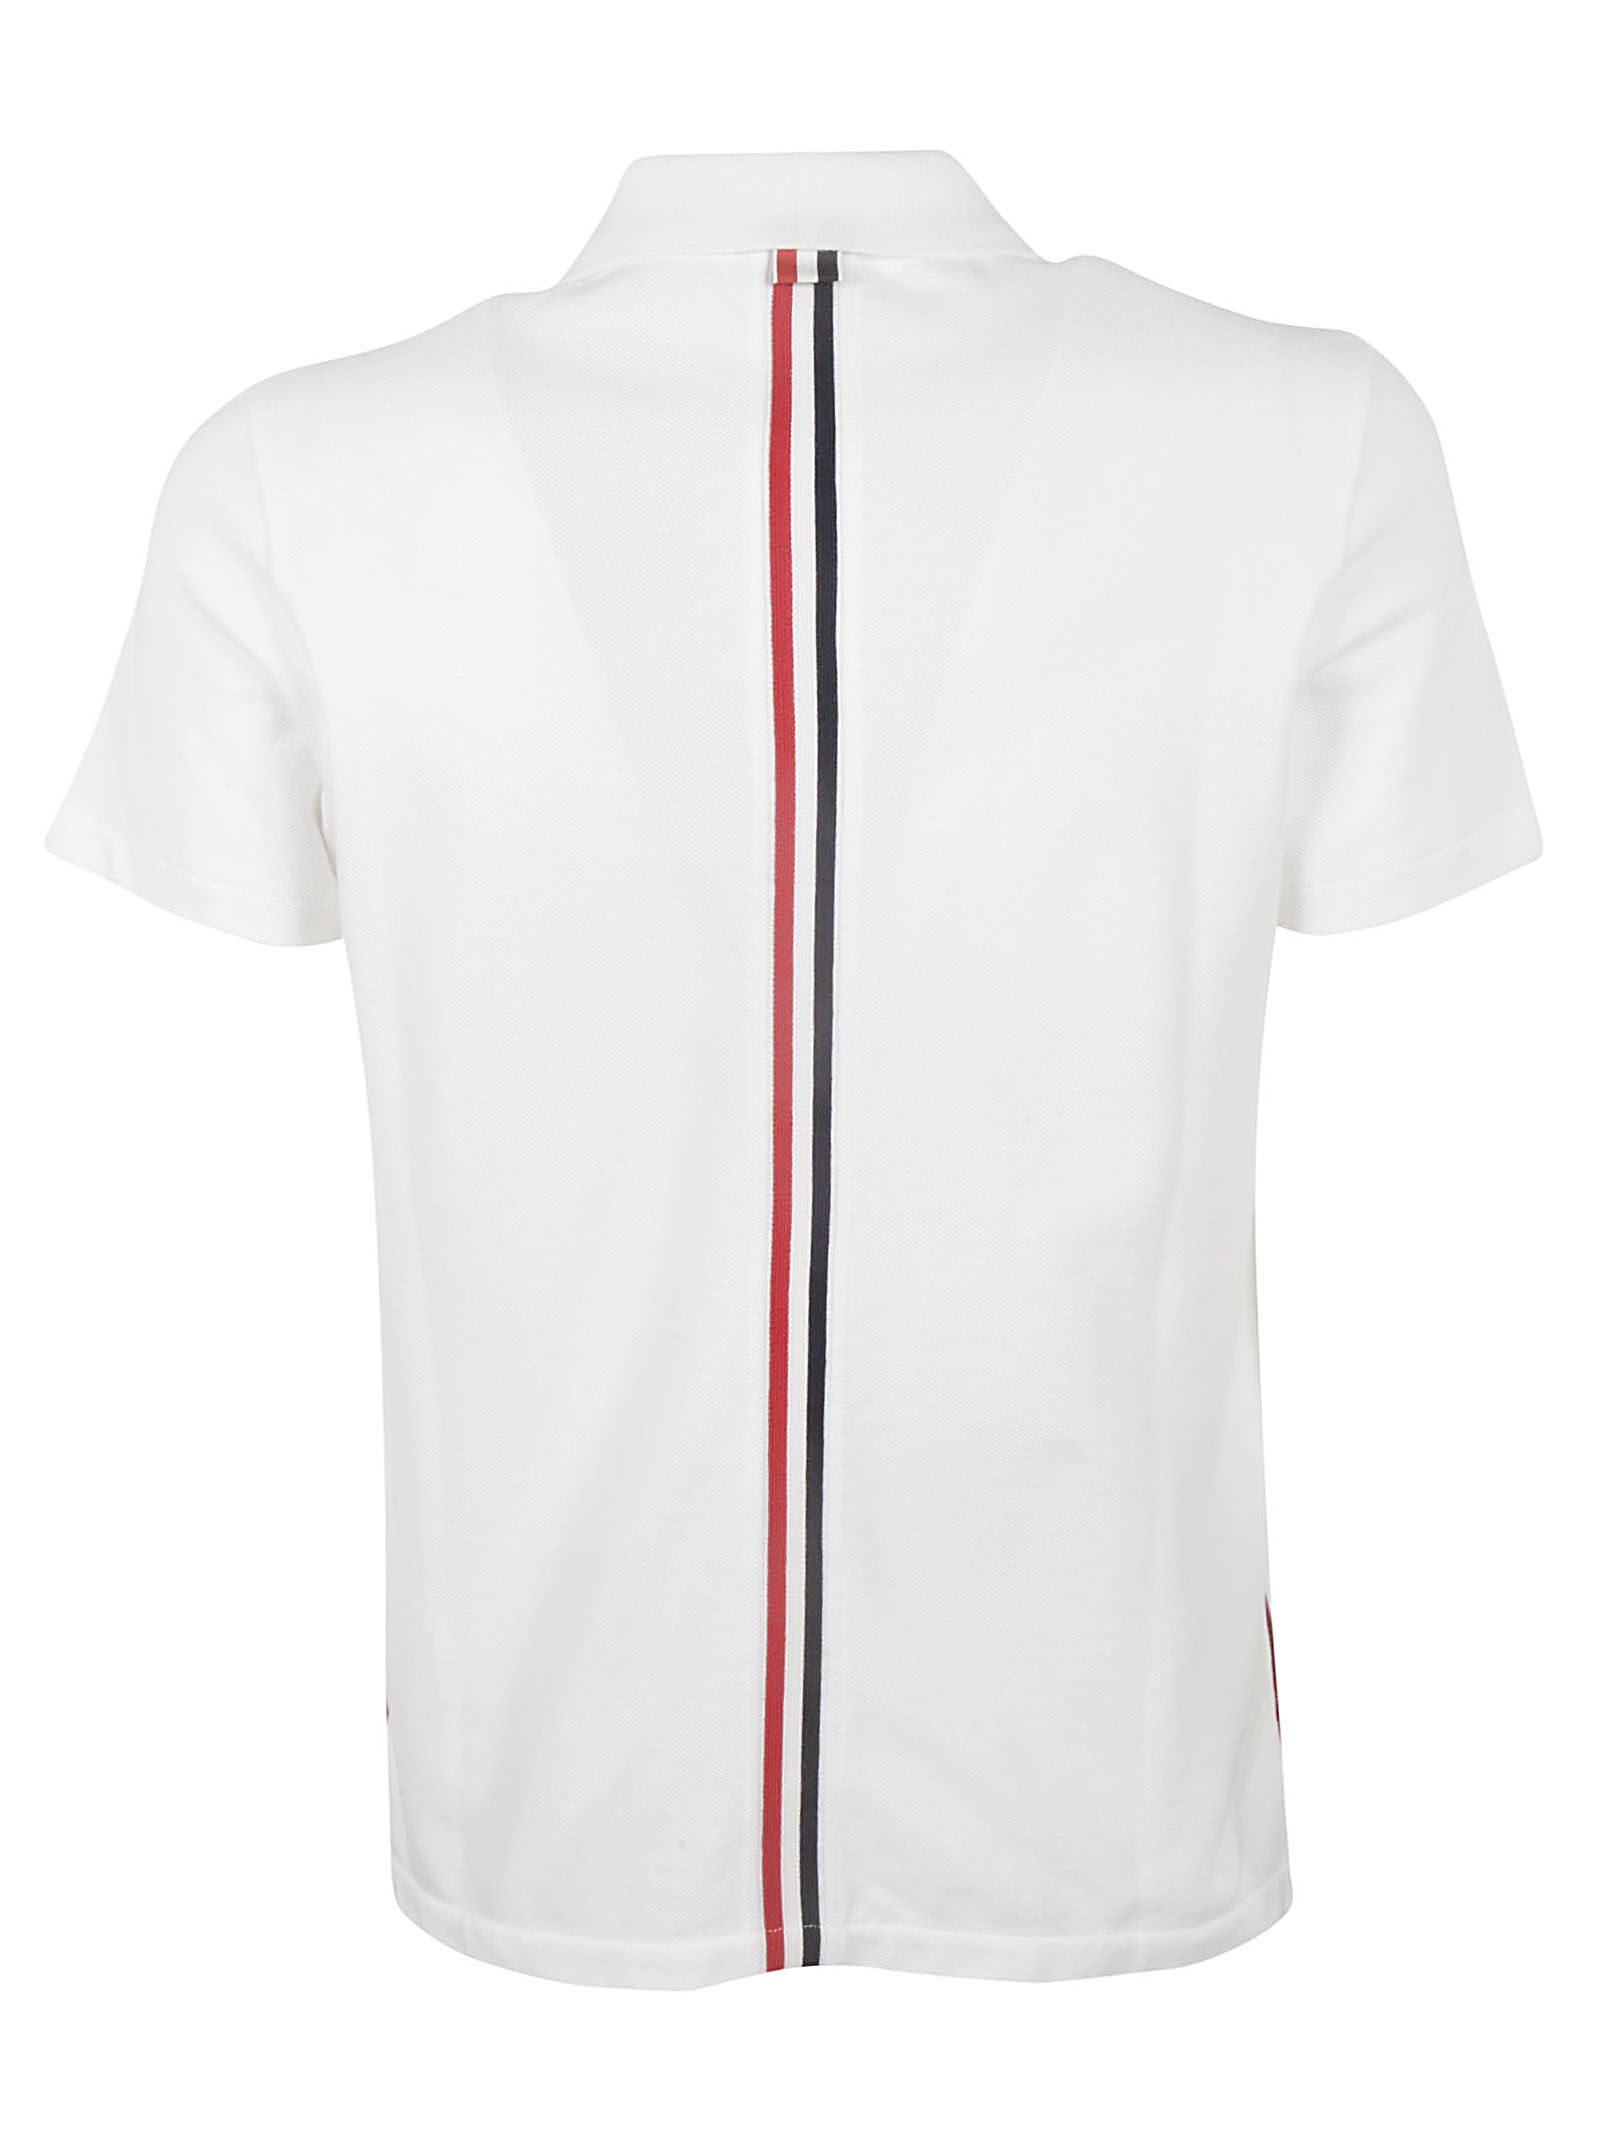 4ad37727 Thom Browne Thom Browne Signature Stripe Polo Shirt - WHITE ...